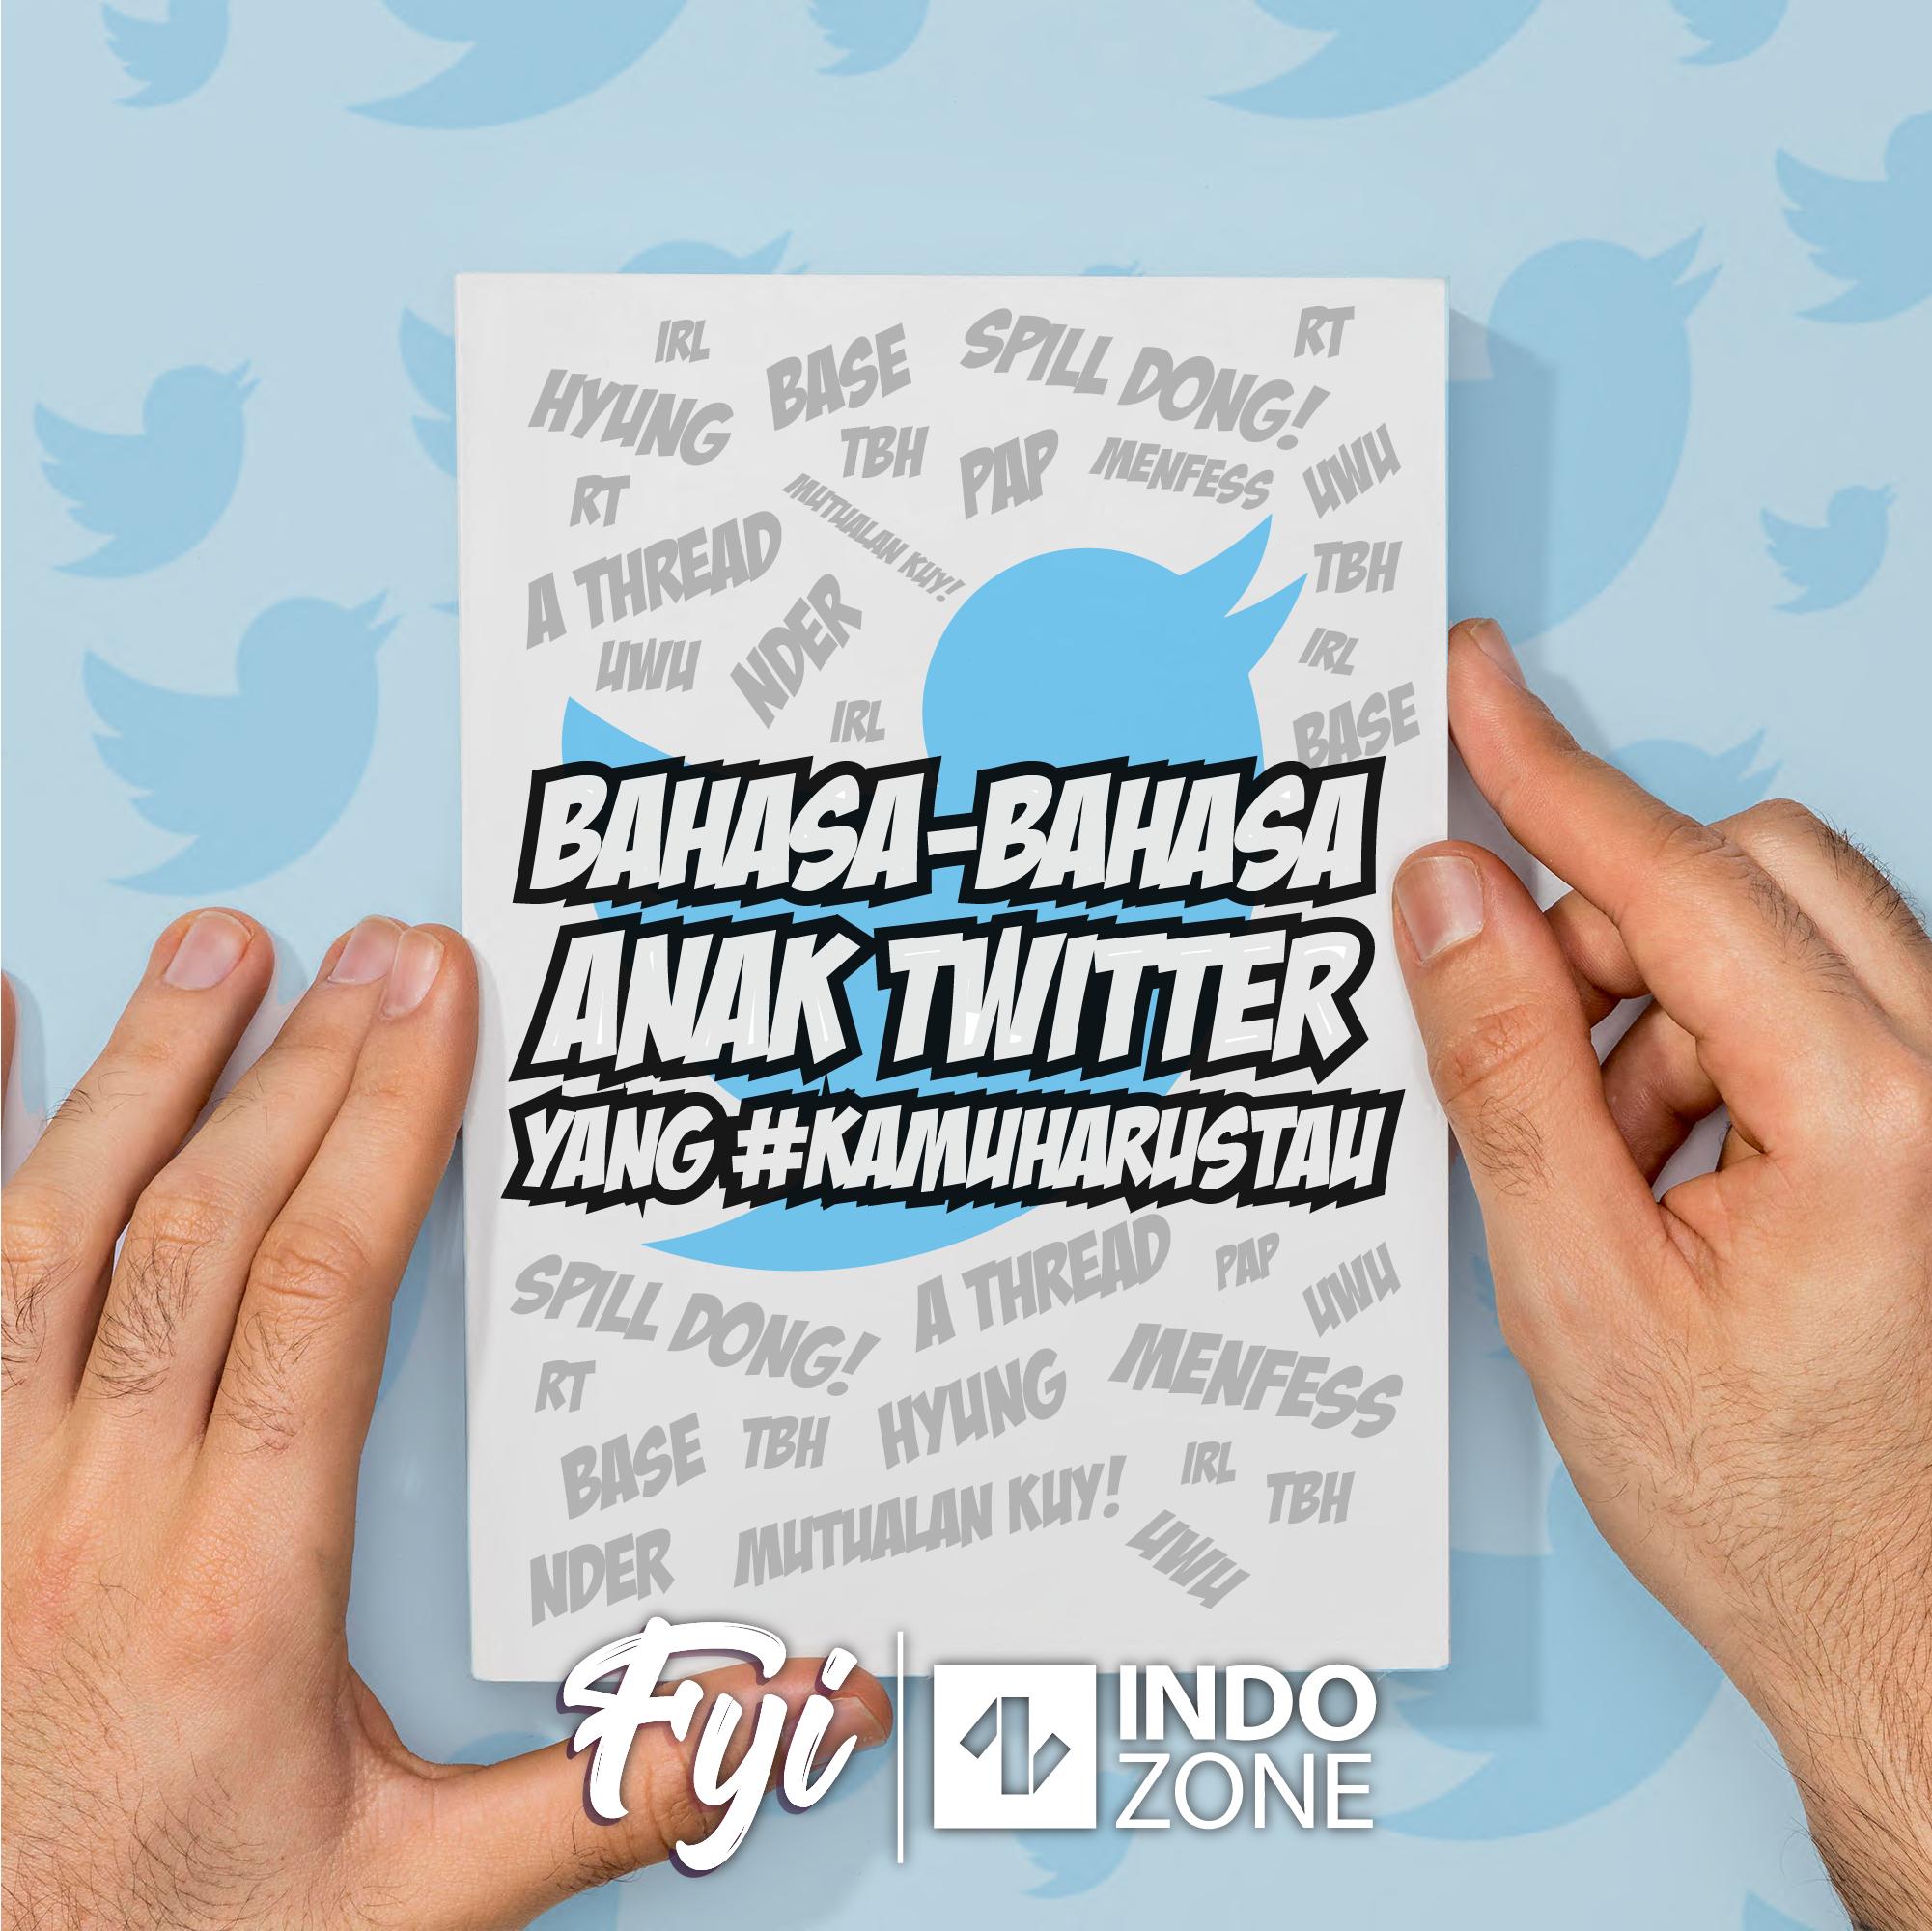 Bahasa-Bahasa Anak Twitter yang #KAMUHARUSTAU